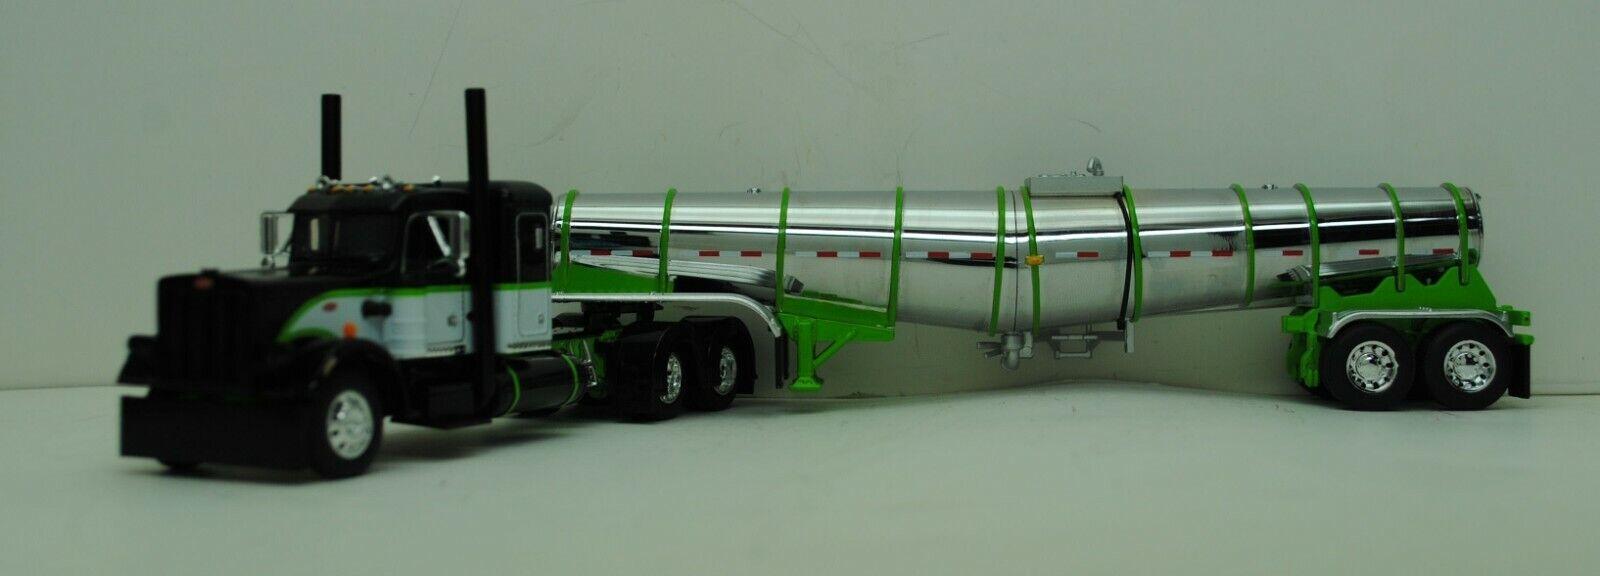 DCP 1/64 SCALE 359 PETERBILT SMALL BUNK LIME GREEN, BLACK, WHITE & POLAR TANKER  1